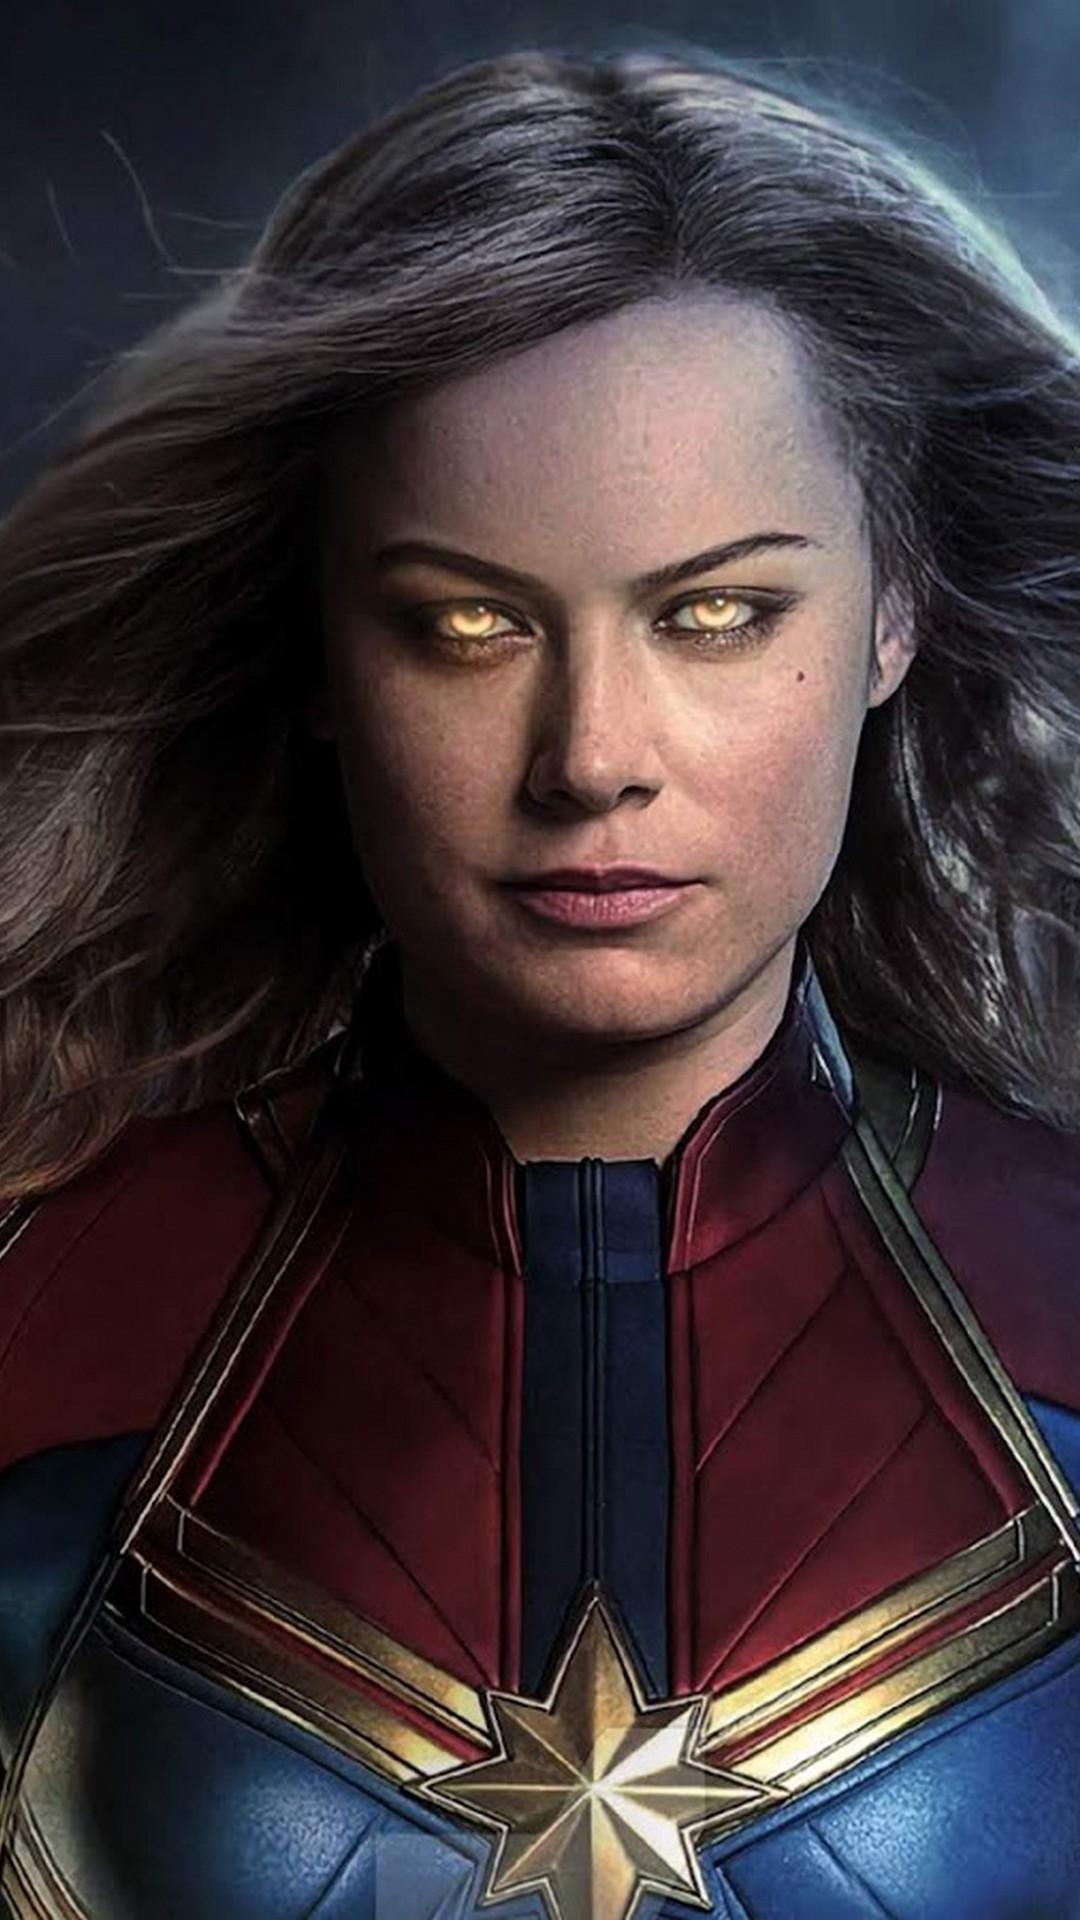 Captain Marvel Phone Wallpaper 2020 Phone Wallpaper HD 1080x1920